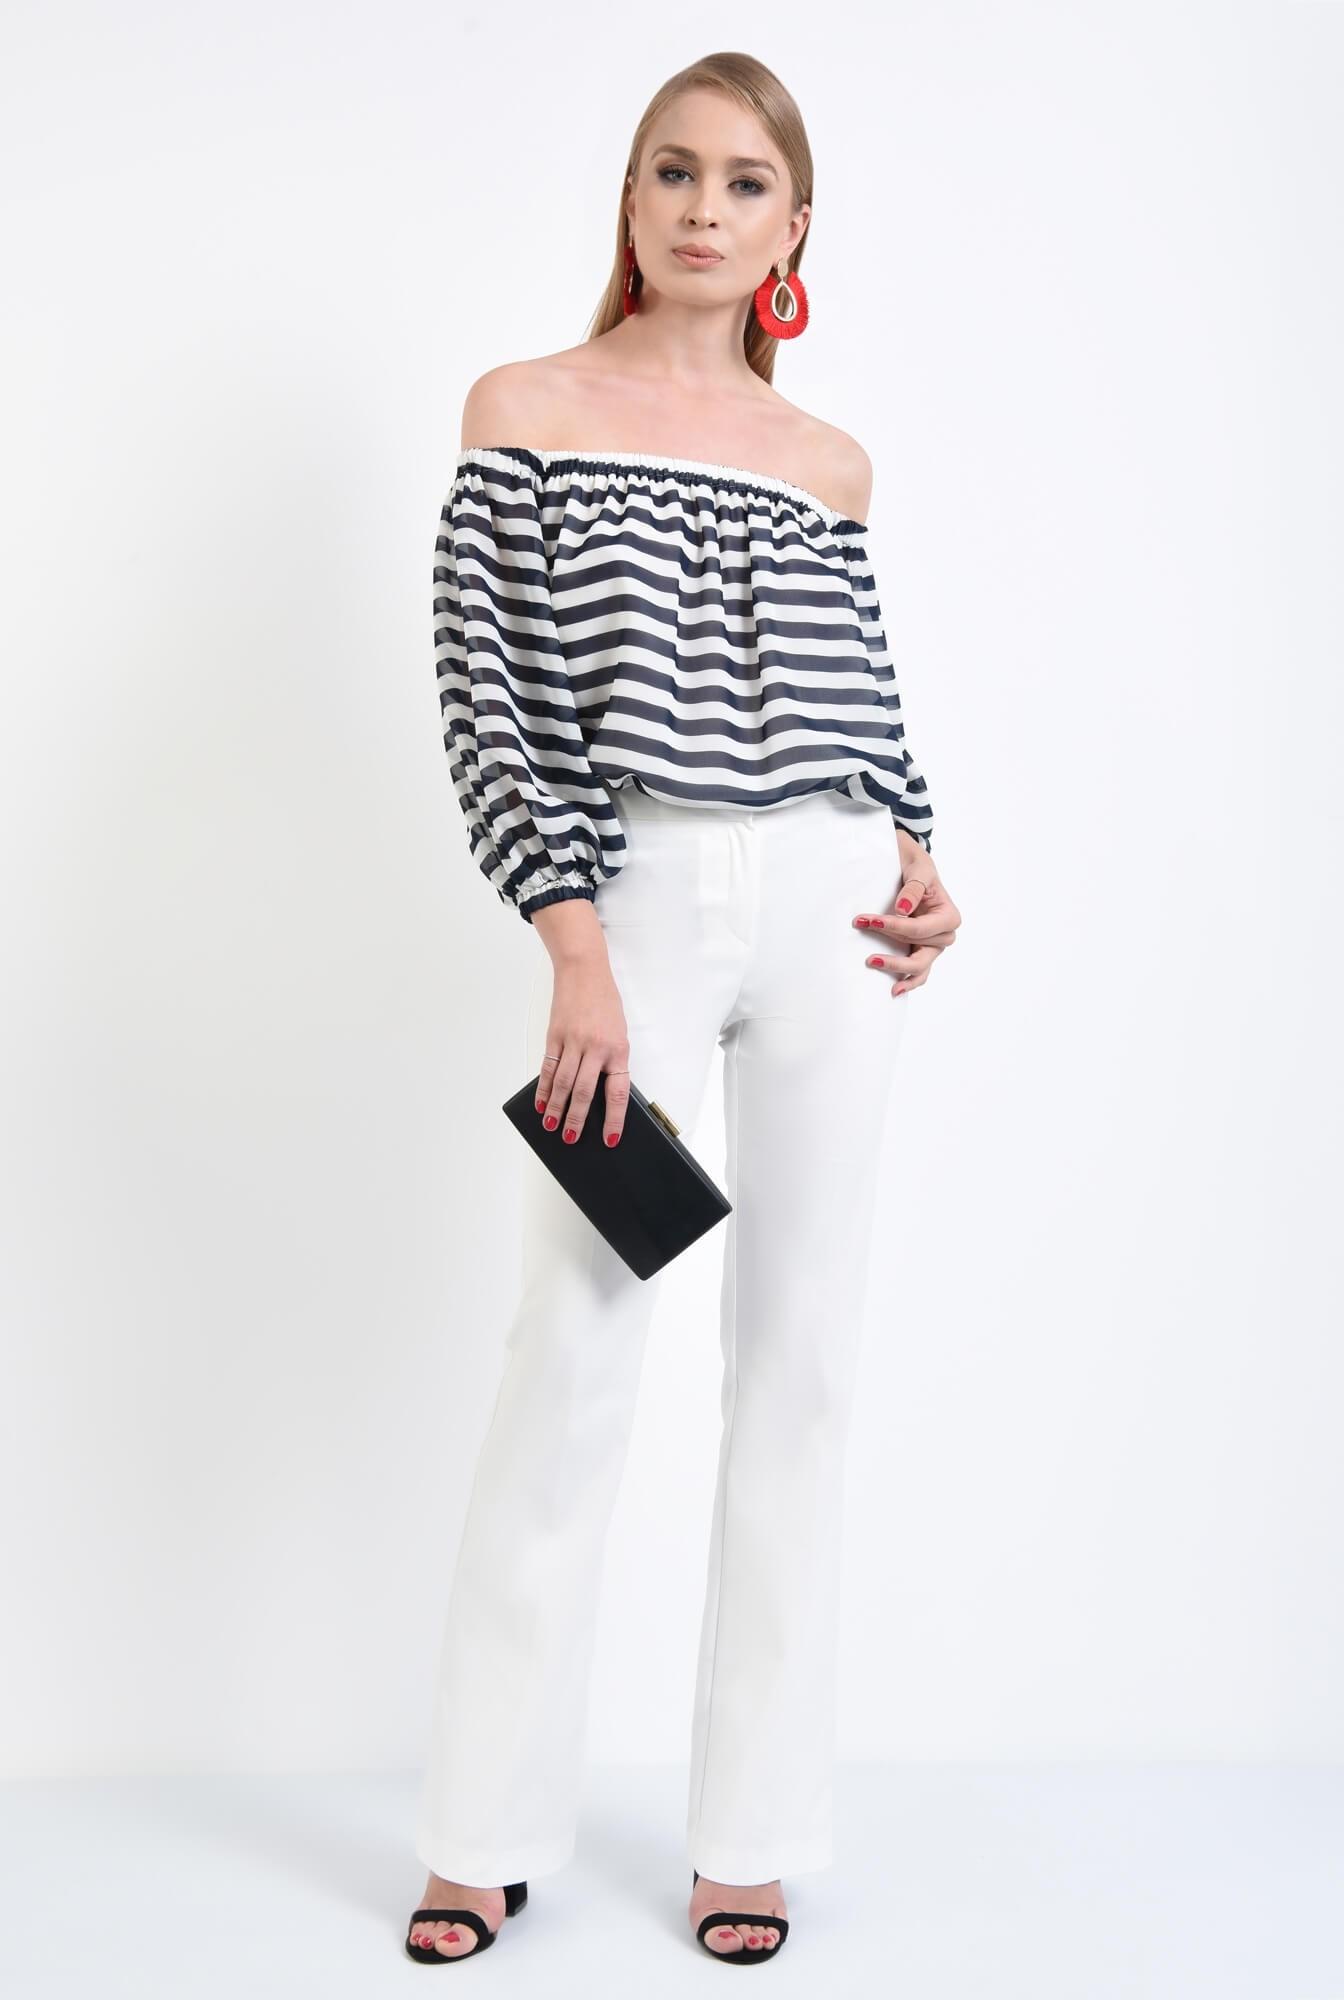 3 - bluza eleganta cu dungi, alb, bleumarin, decolteu elastic, sifon, maneci lungi